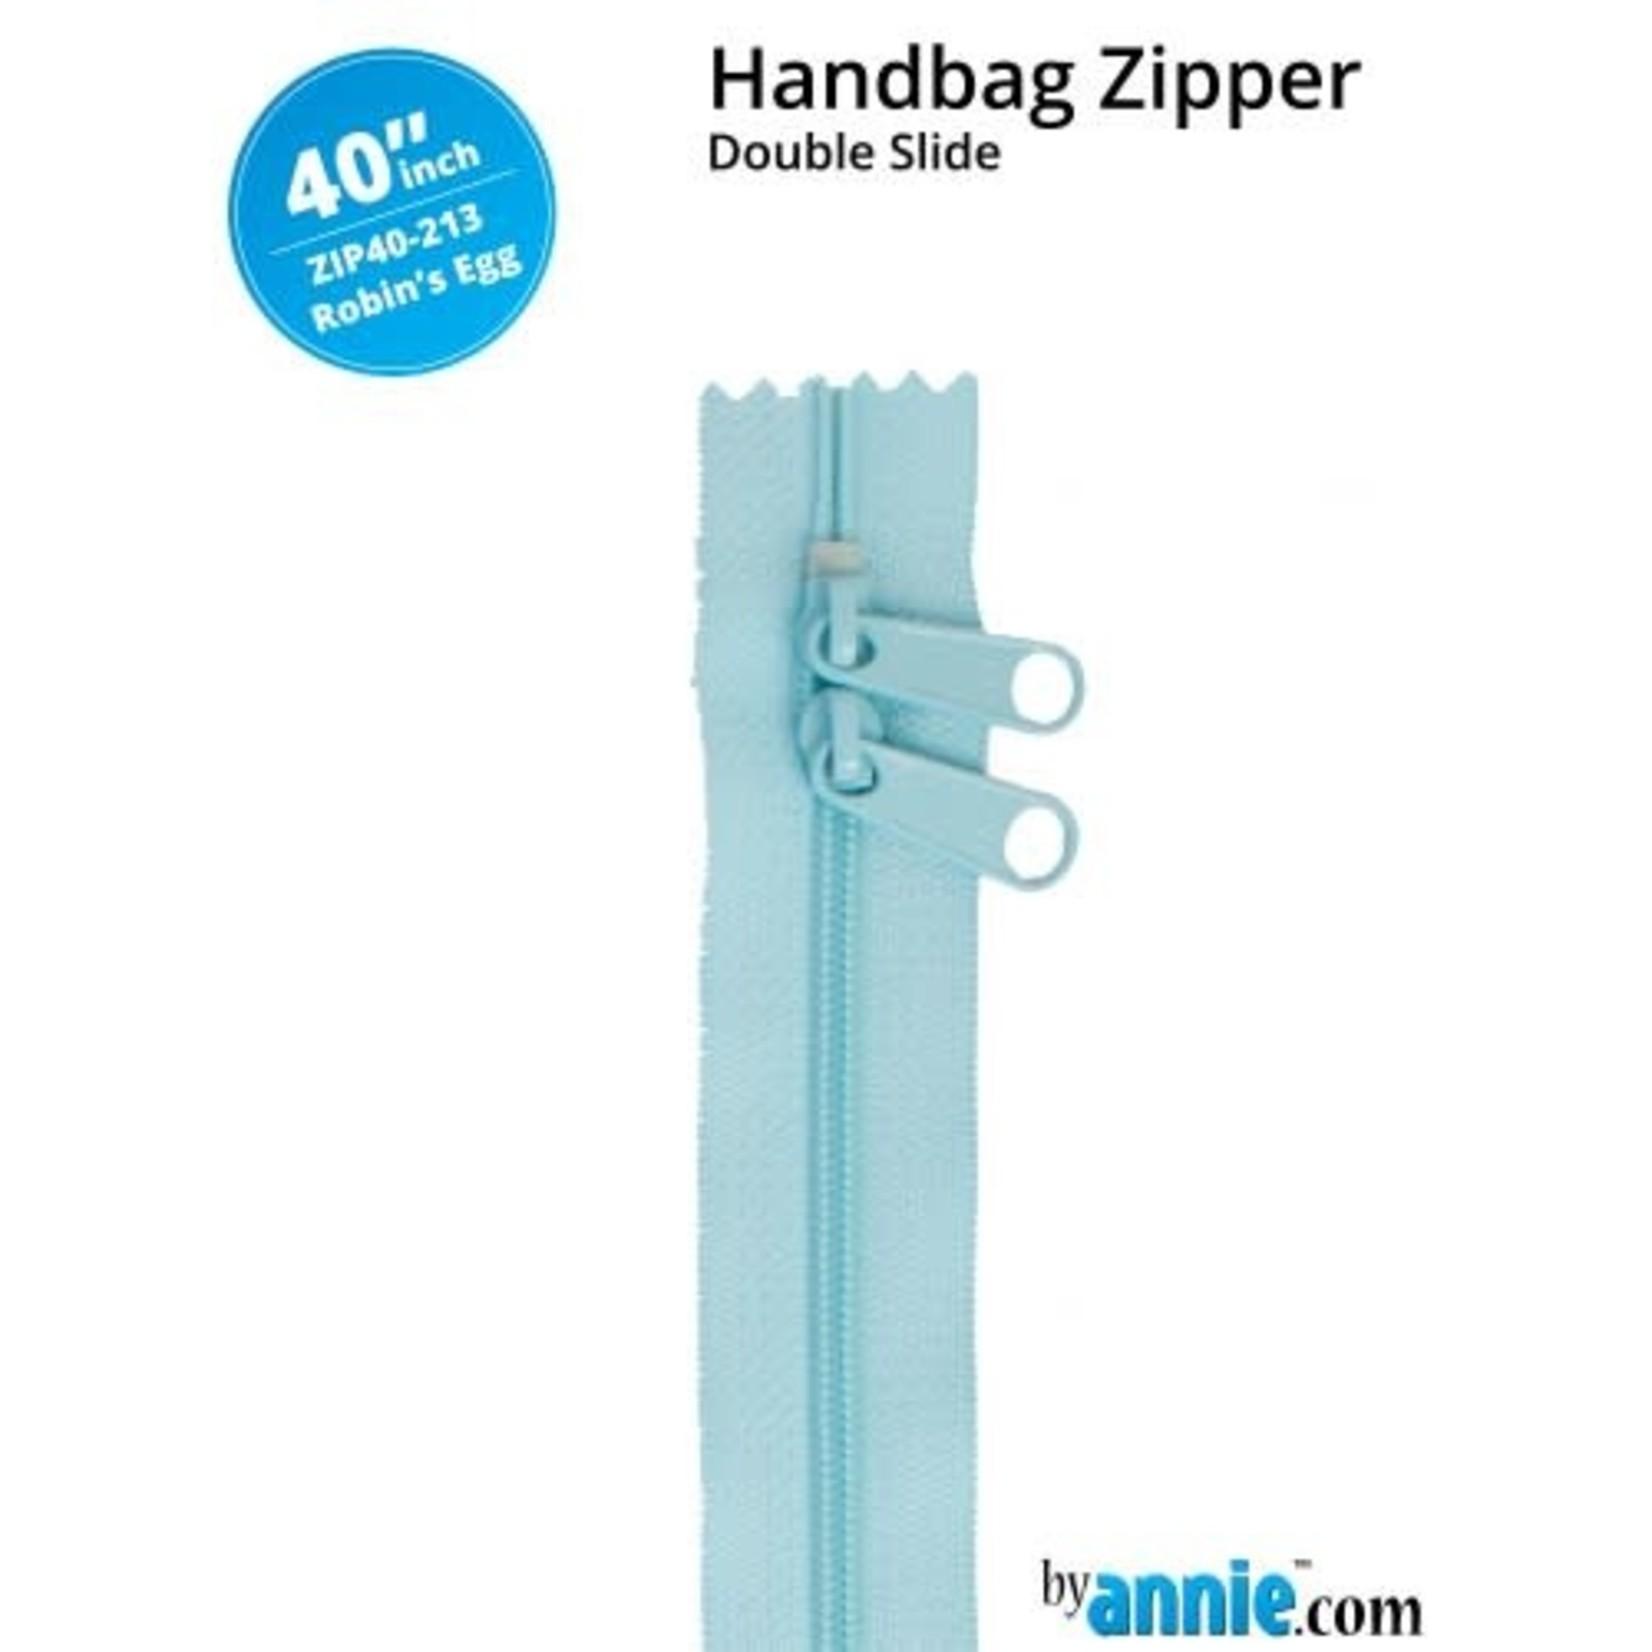 "BY ANNIE Double Slide Handbag Zipper 40"" Blue/Purple"